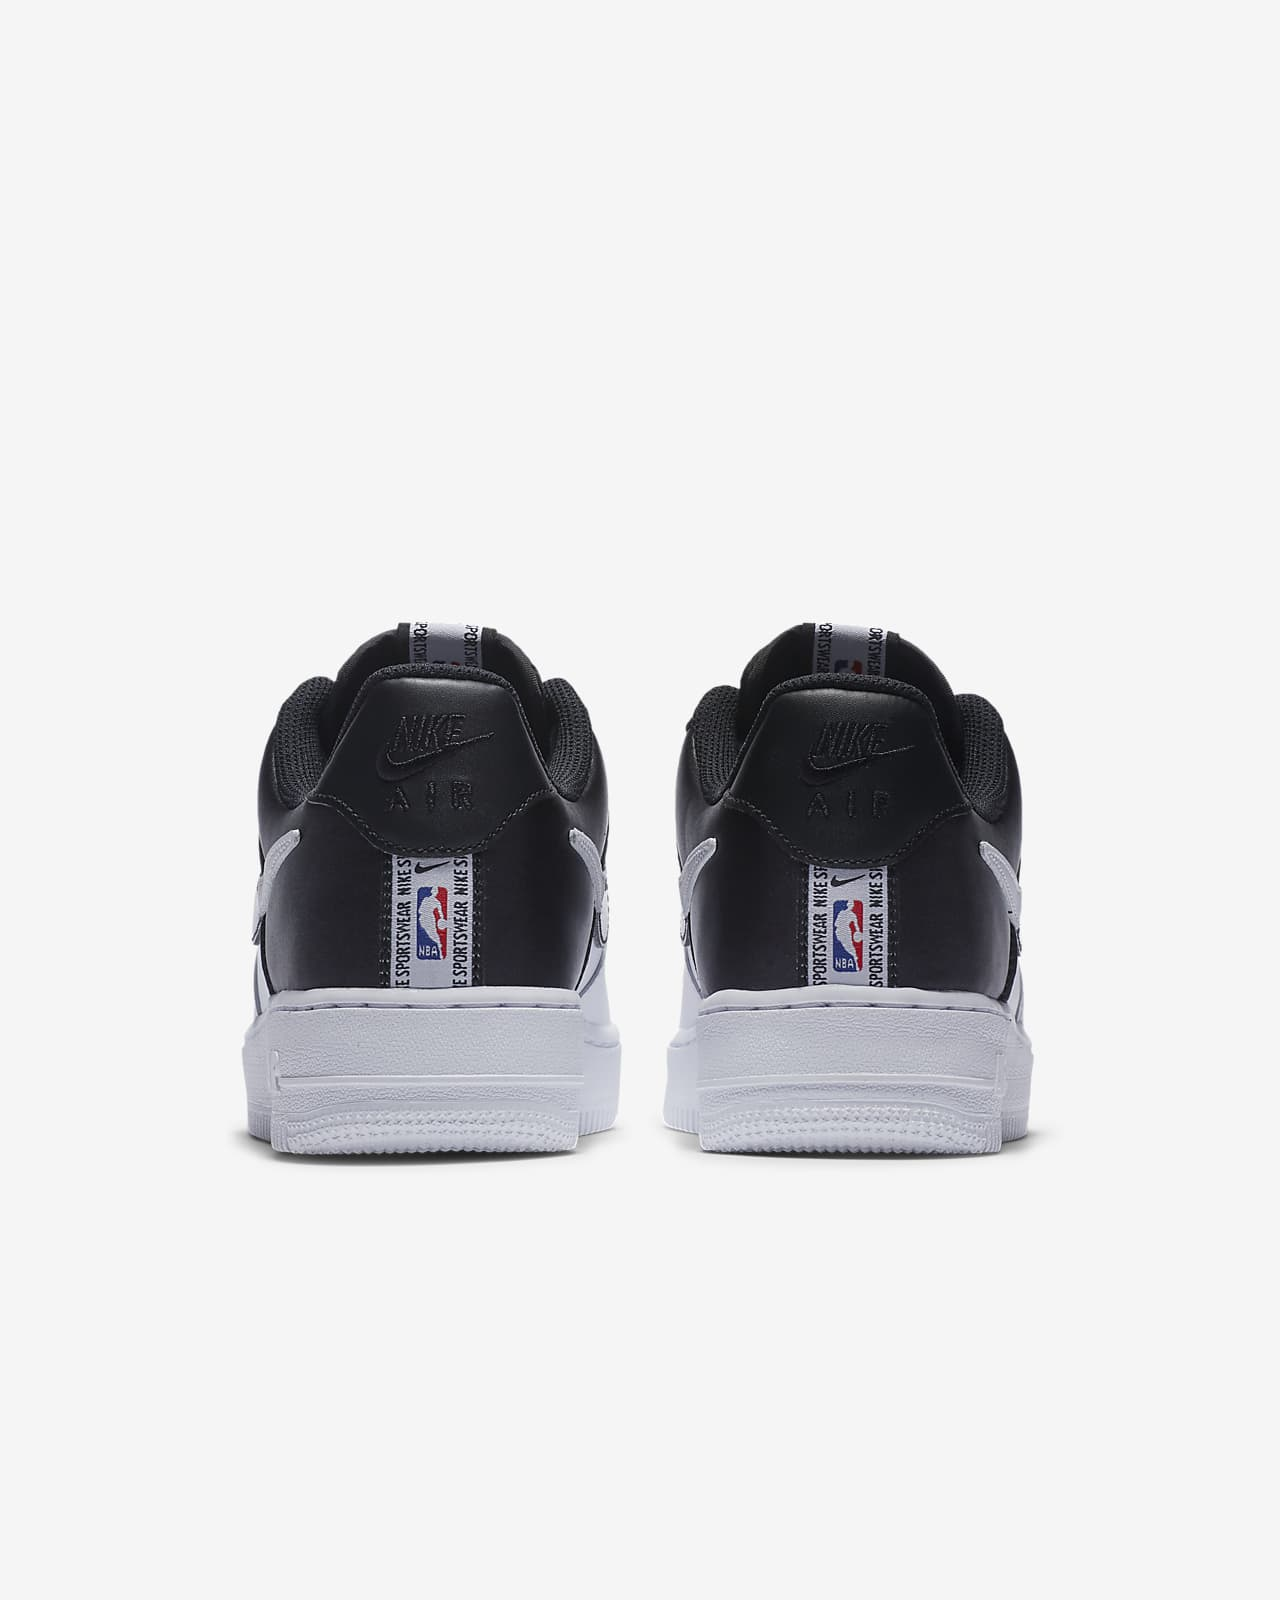 air force 1 bianche e nere nba